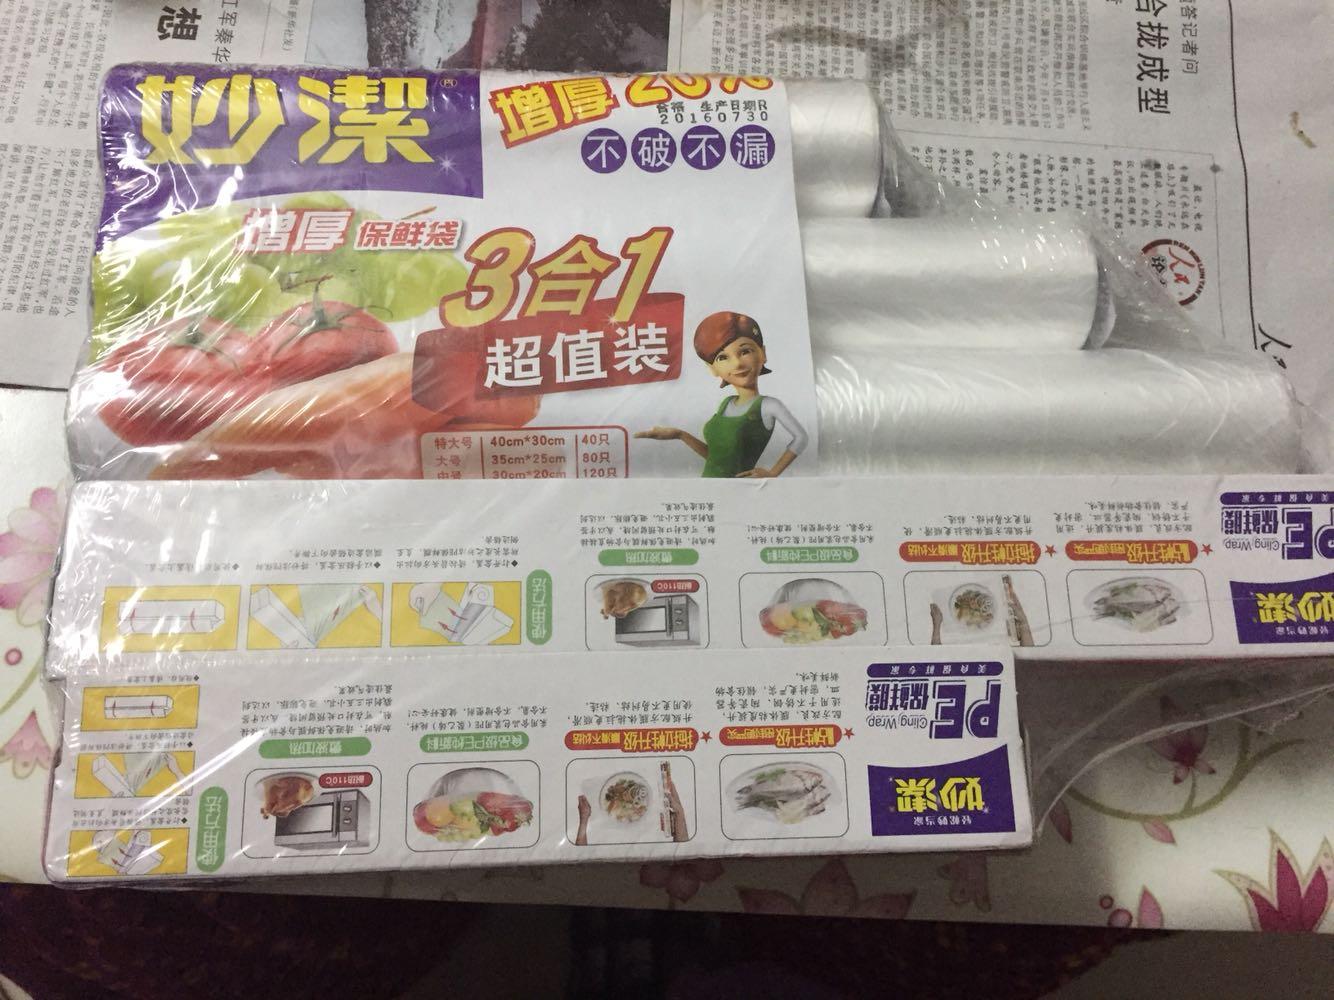 hong kong online store cell phone 00233513 mall